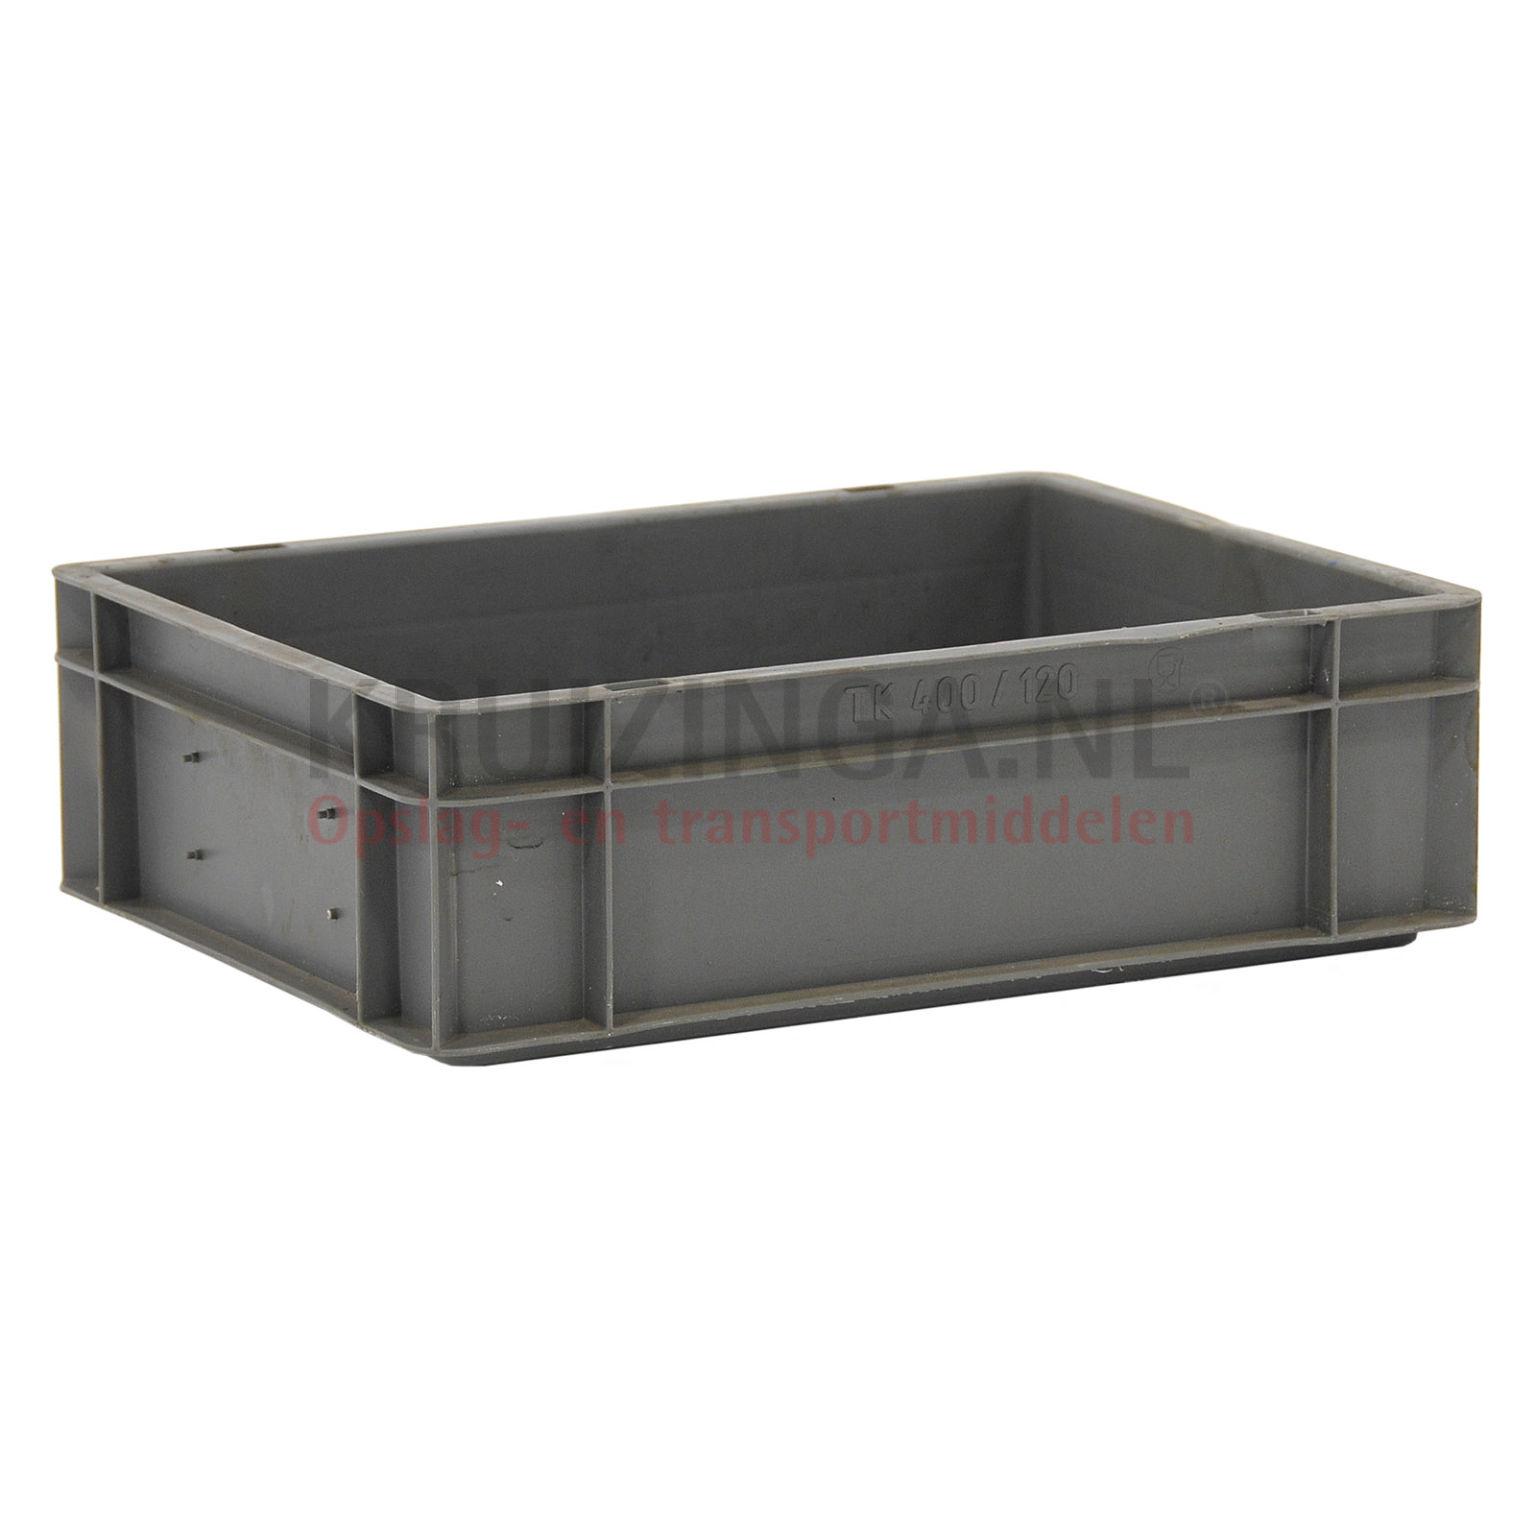 stapelboxen kunststoff stapelbar alle w nde geschlossen gebraucht. Black Bedroom Furniture Sets. Home Design Ideas